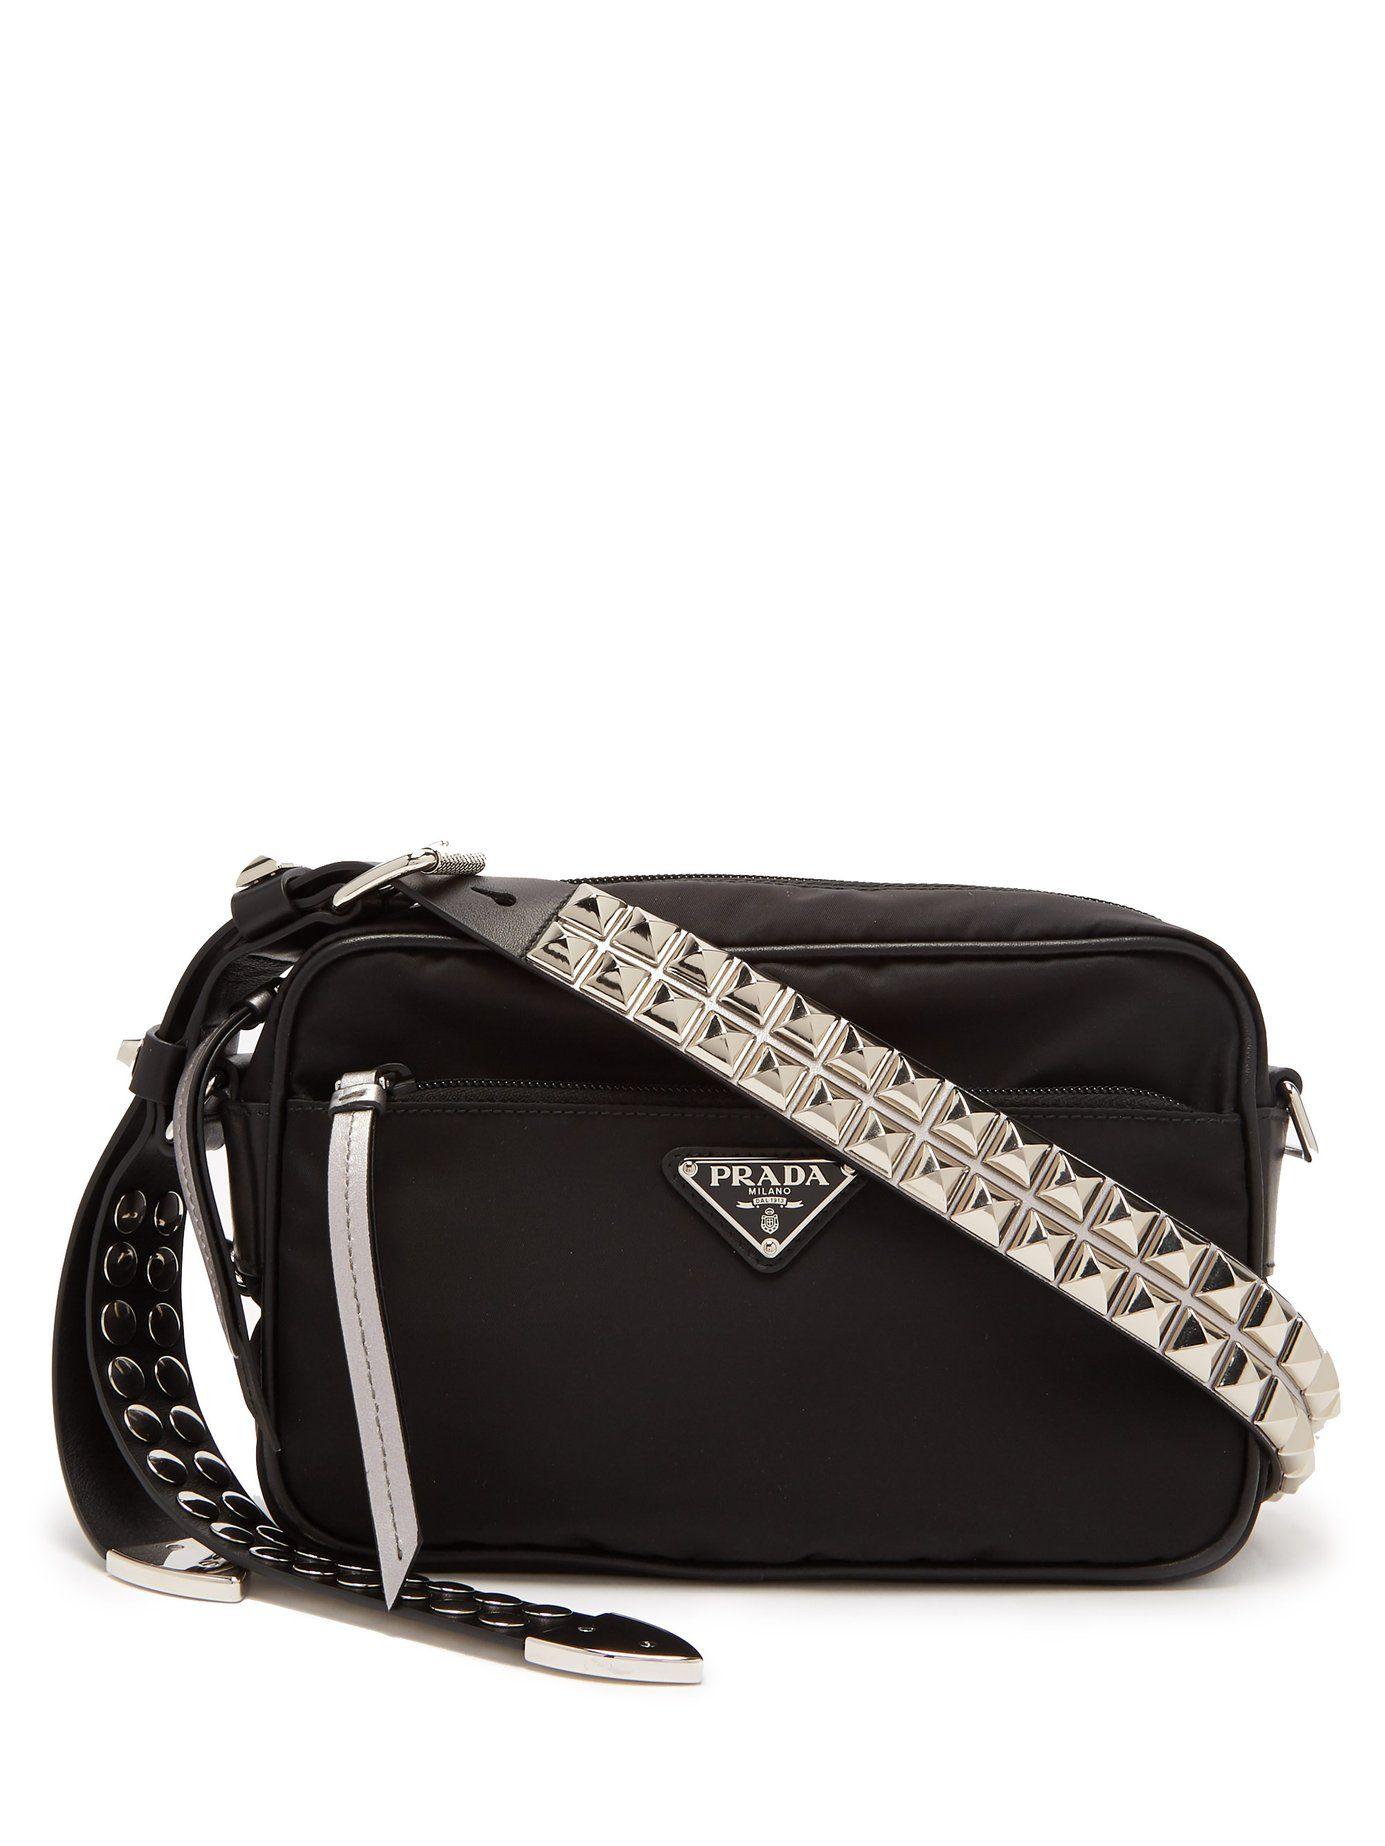 4dff25b9b76878 New Vela nylon cross-body bag | Prada | MATCHESFASHION.COM | 99 ...